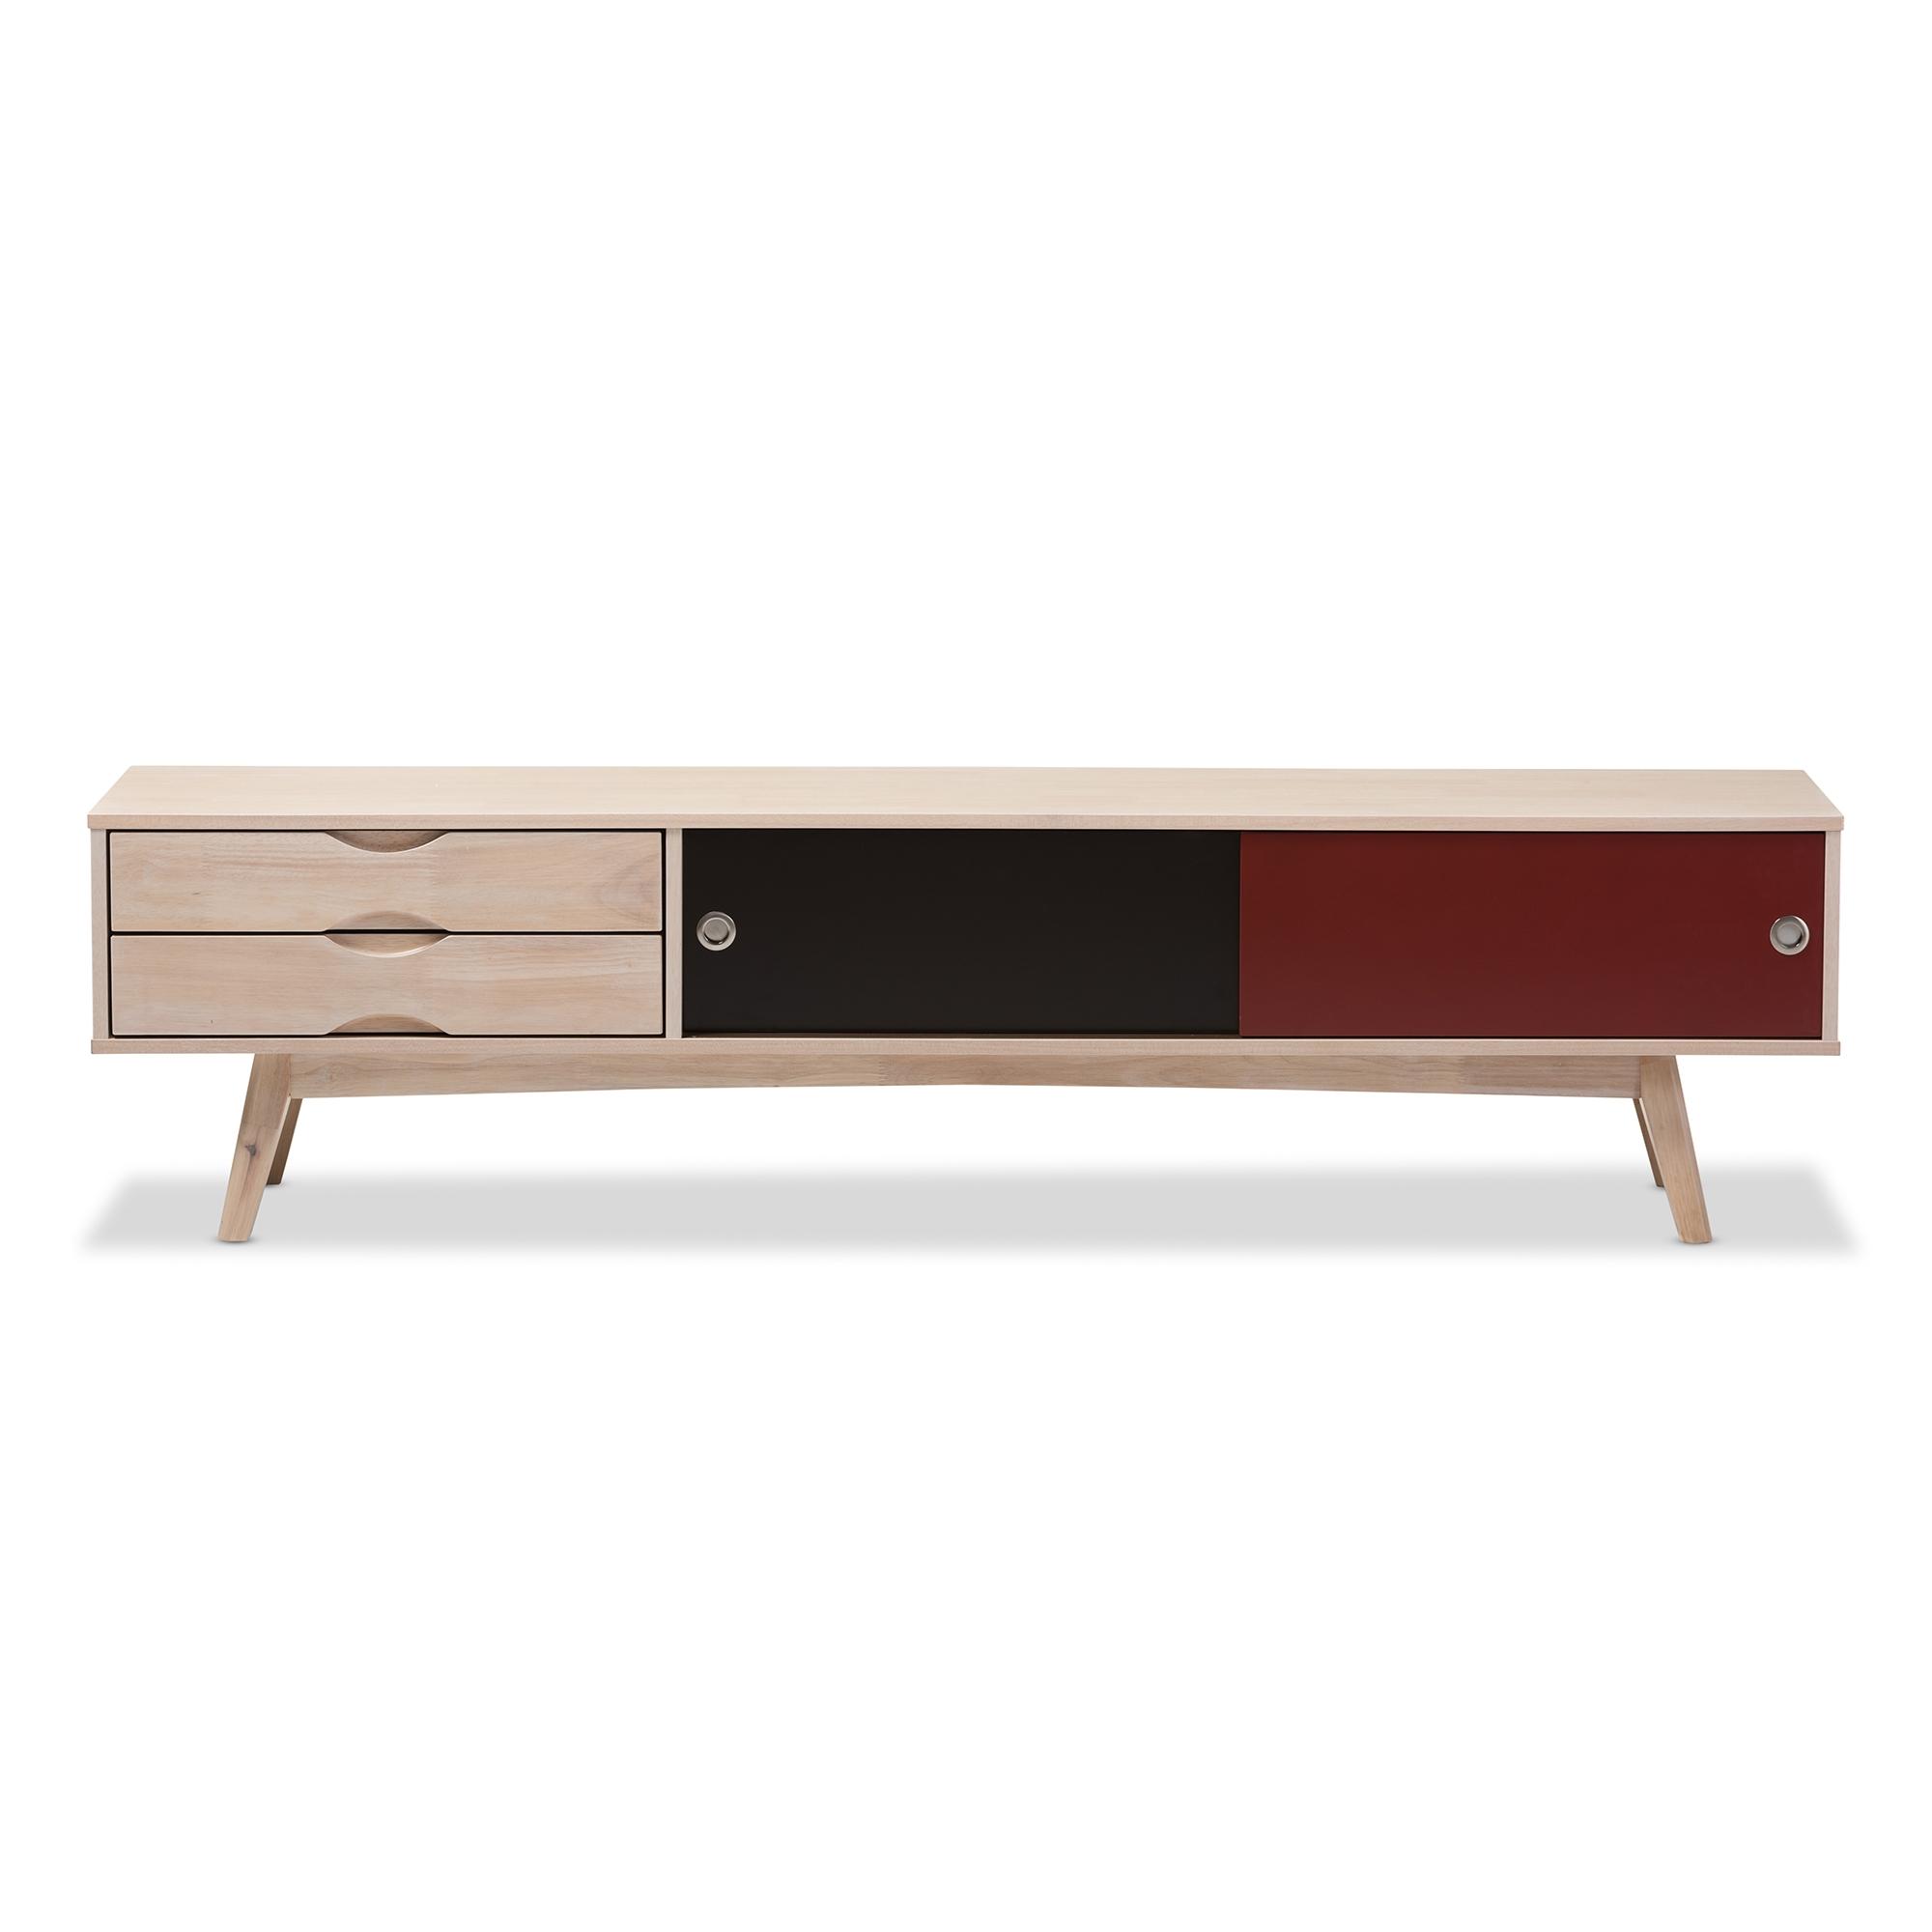 Baxton studio foxhill mid century modern scandinavian inspired multi colored solid rubberwood tv stand